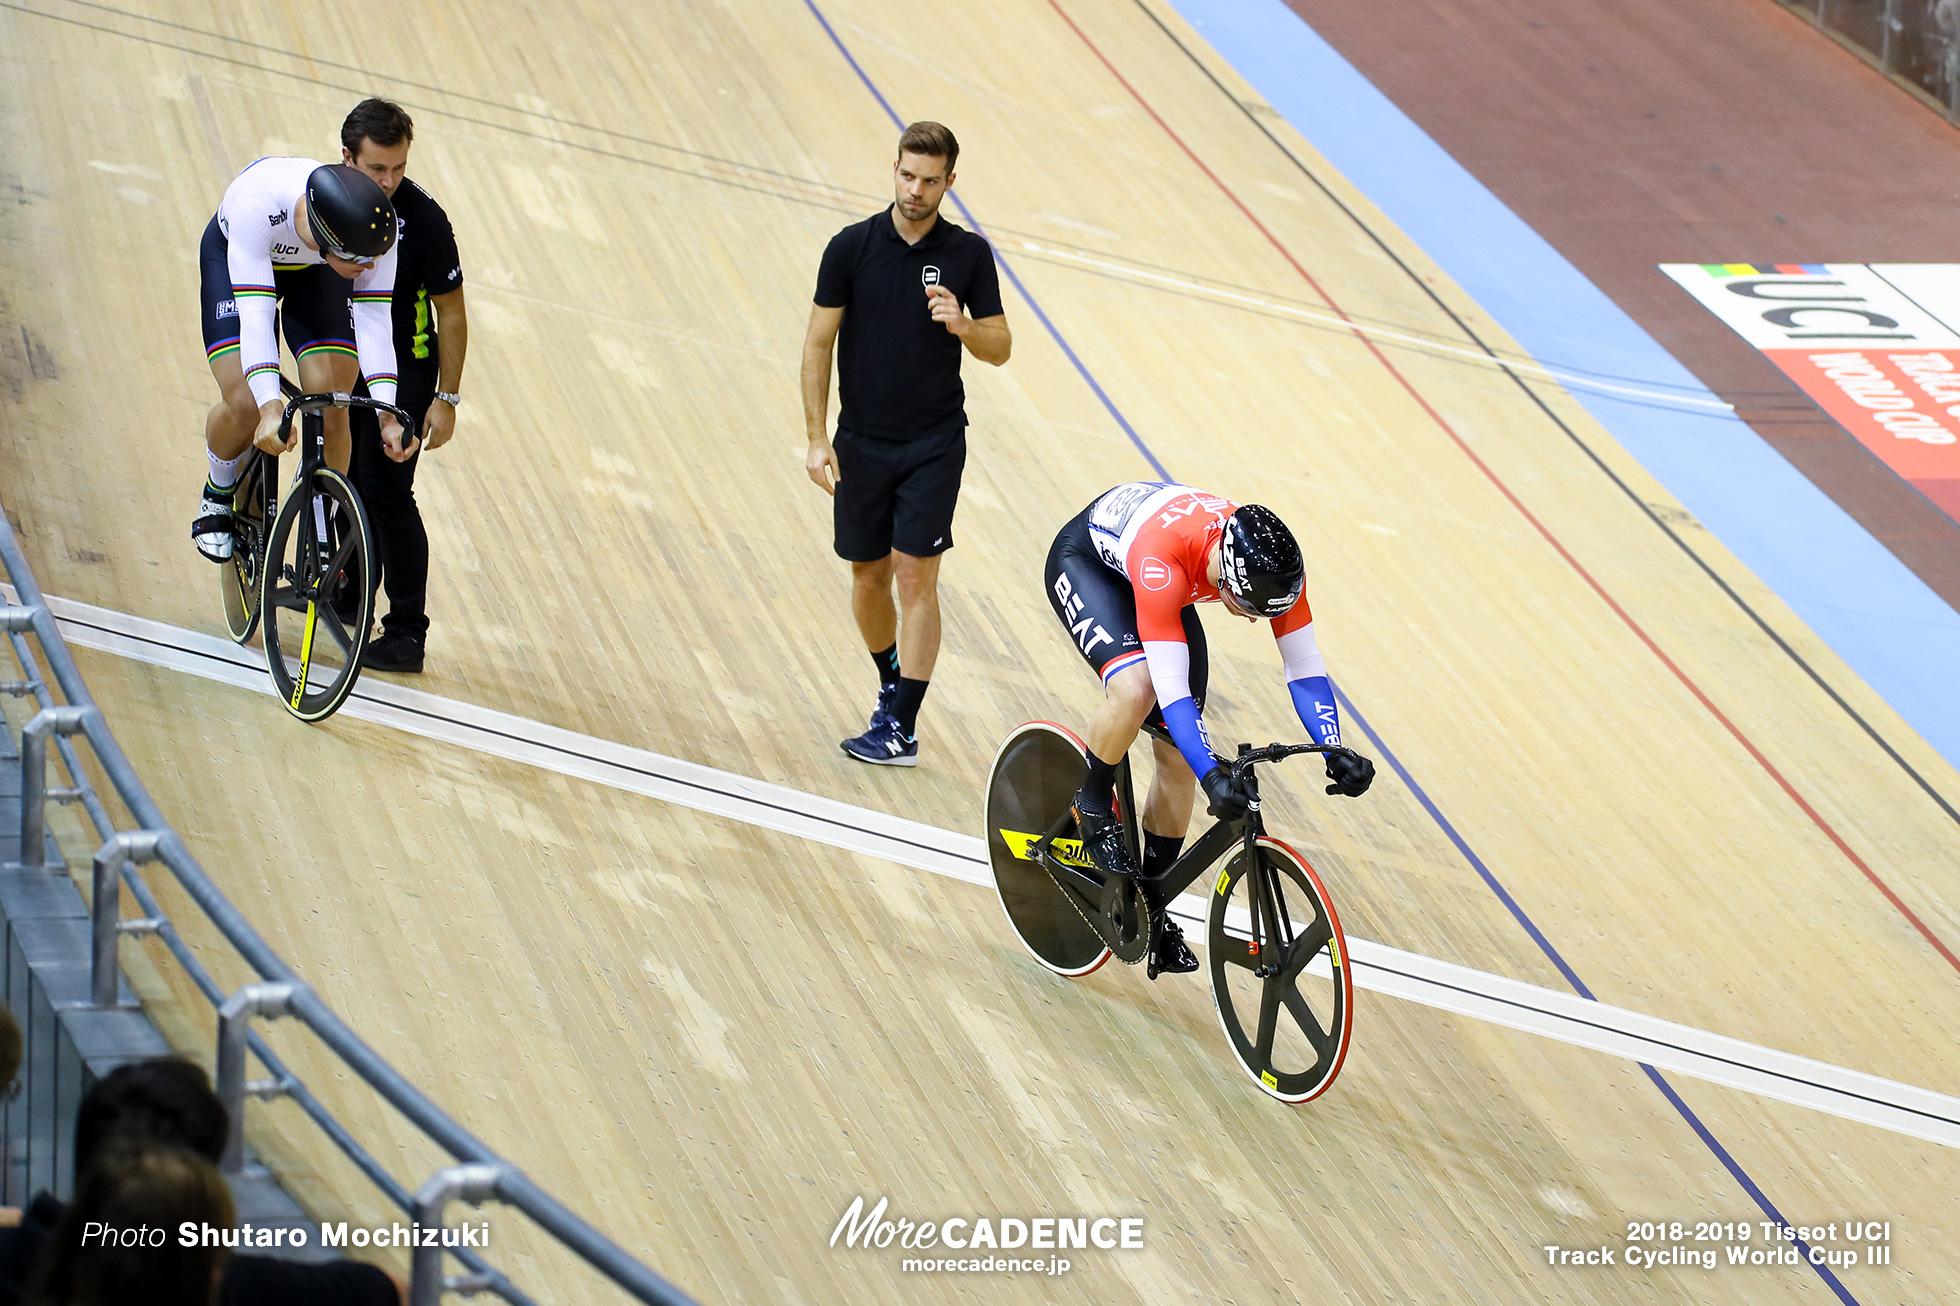 Men'sa Sprint/Final/2018-2019 Track Cycling World Cup III Berlin